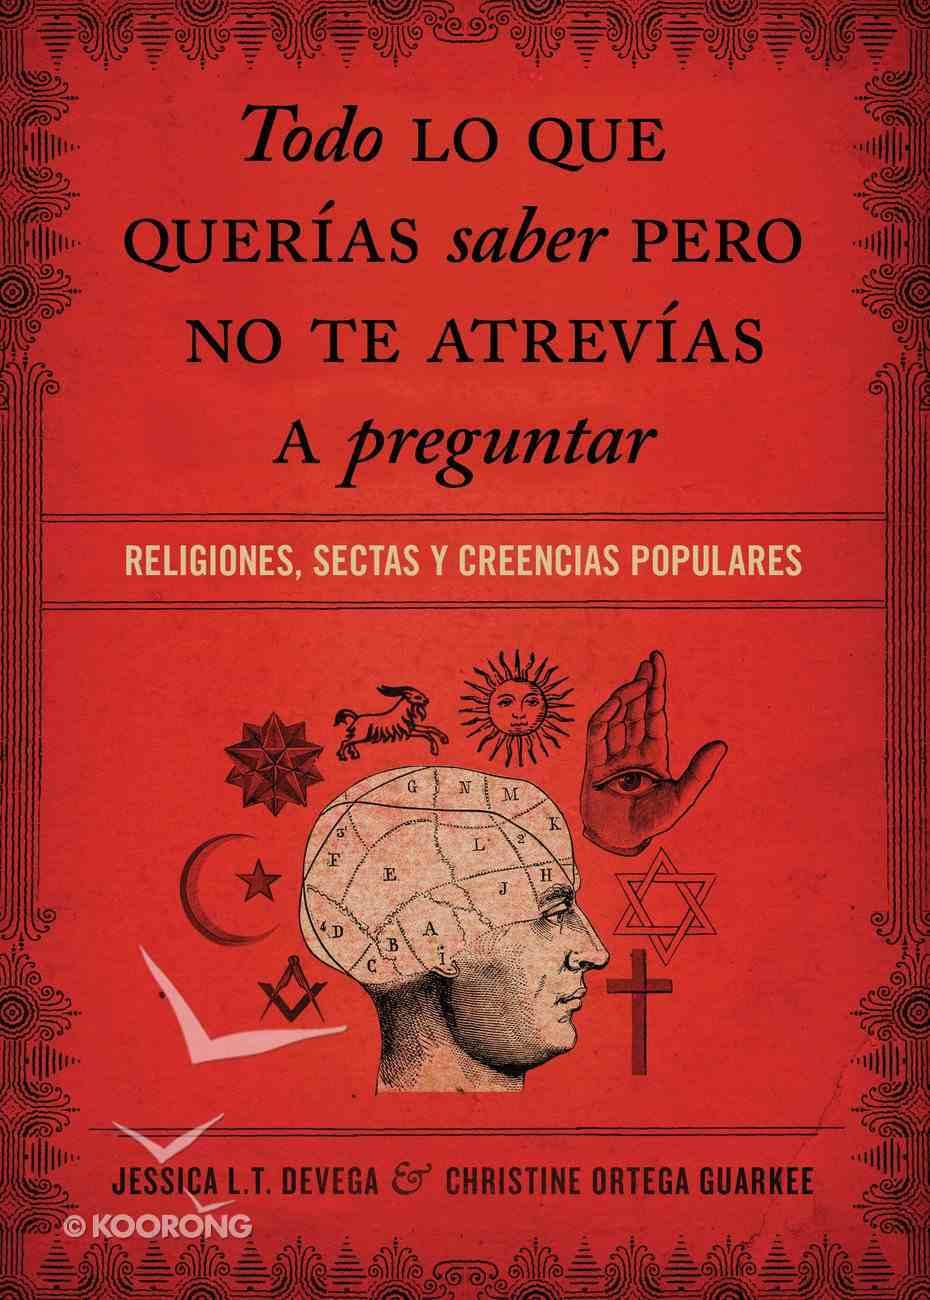 Todo Lo Que Quieres Saber Pero No Te Habias Animado a Preguntar (Spanish) (Spa) (All You Want To Know But Didn't Think You Could Ask) eBook